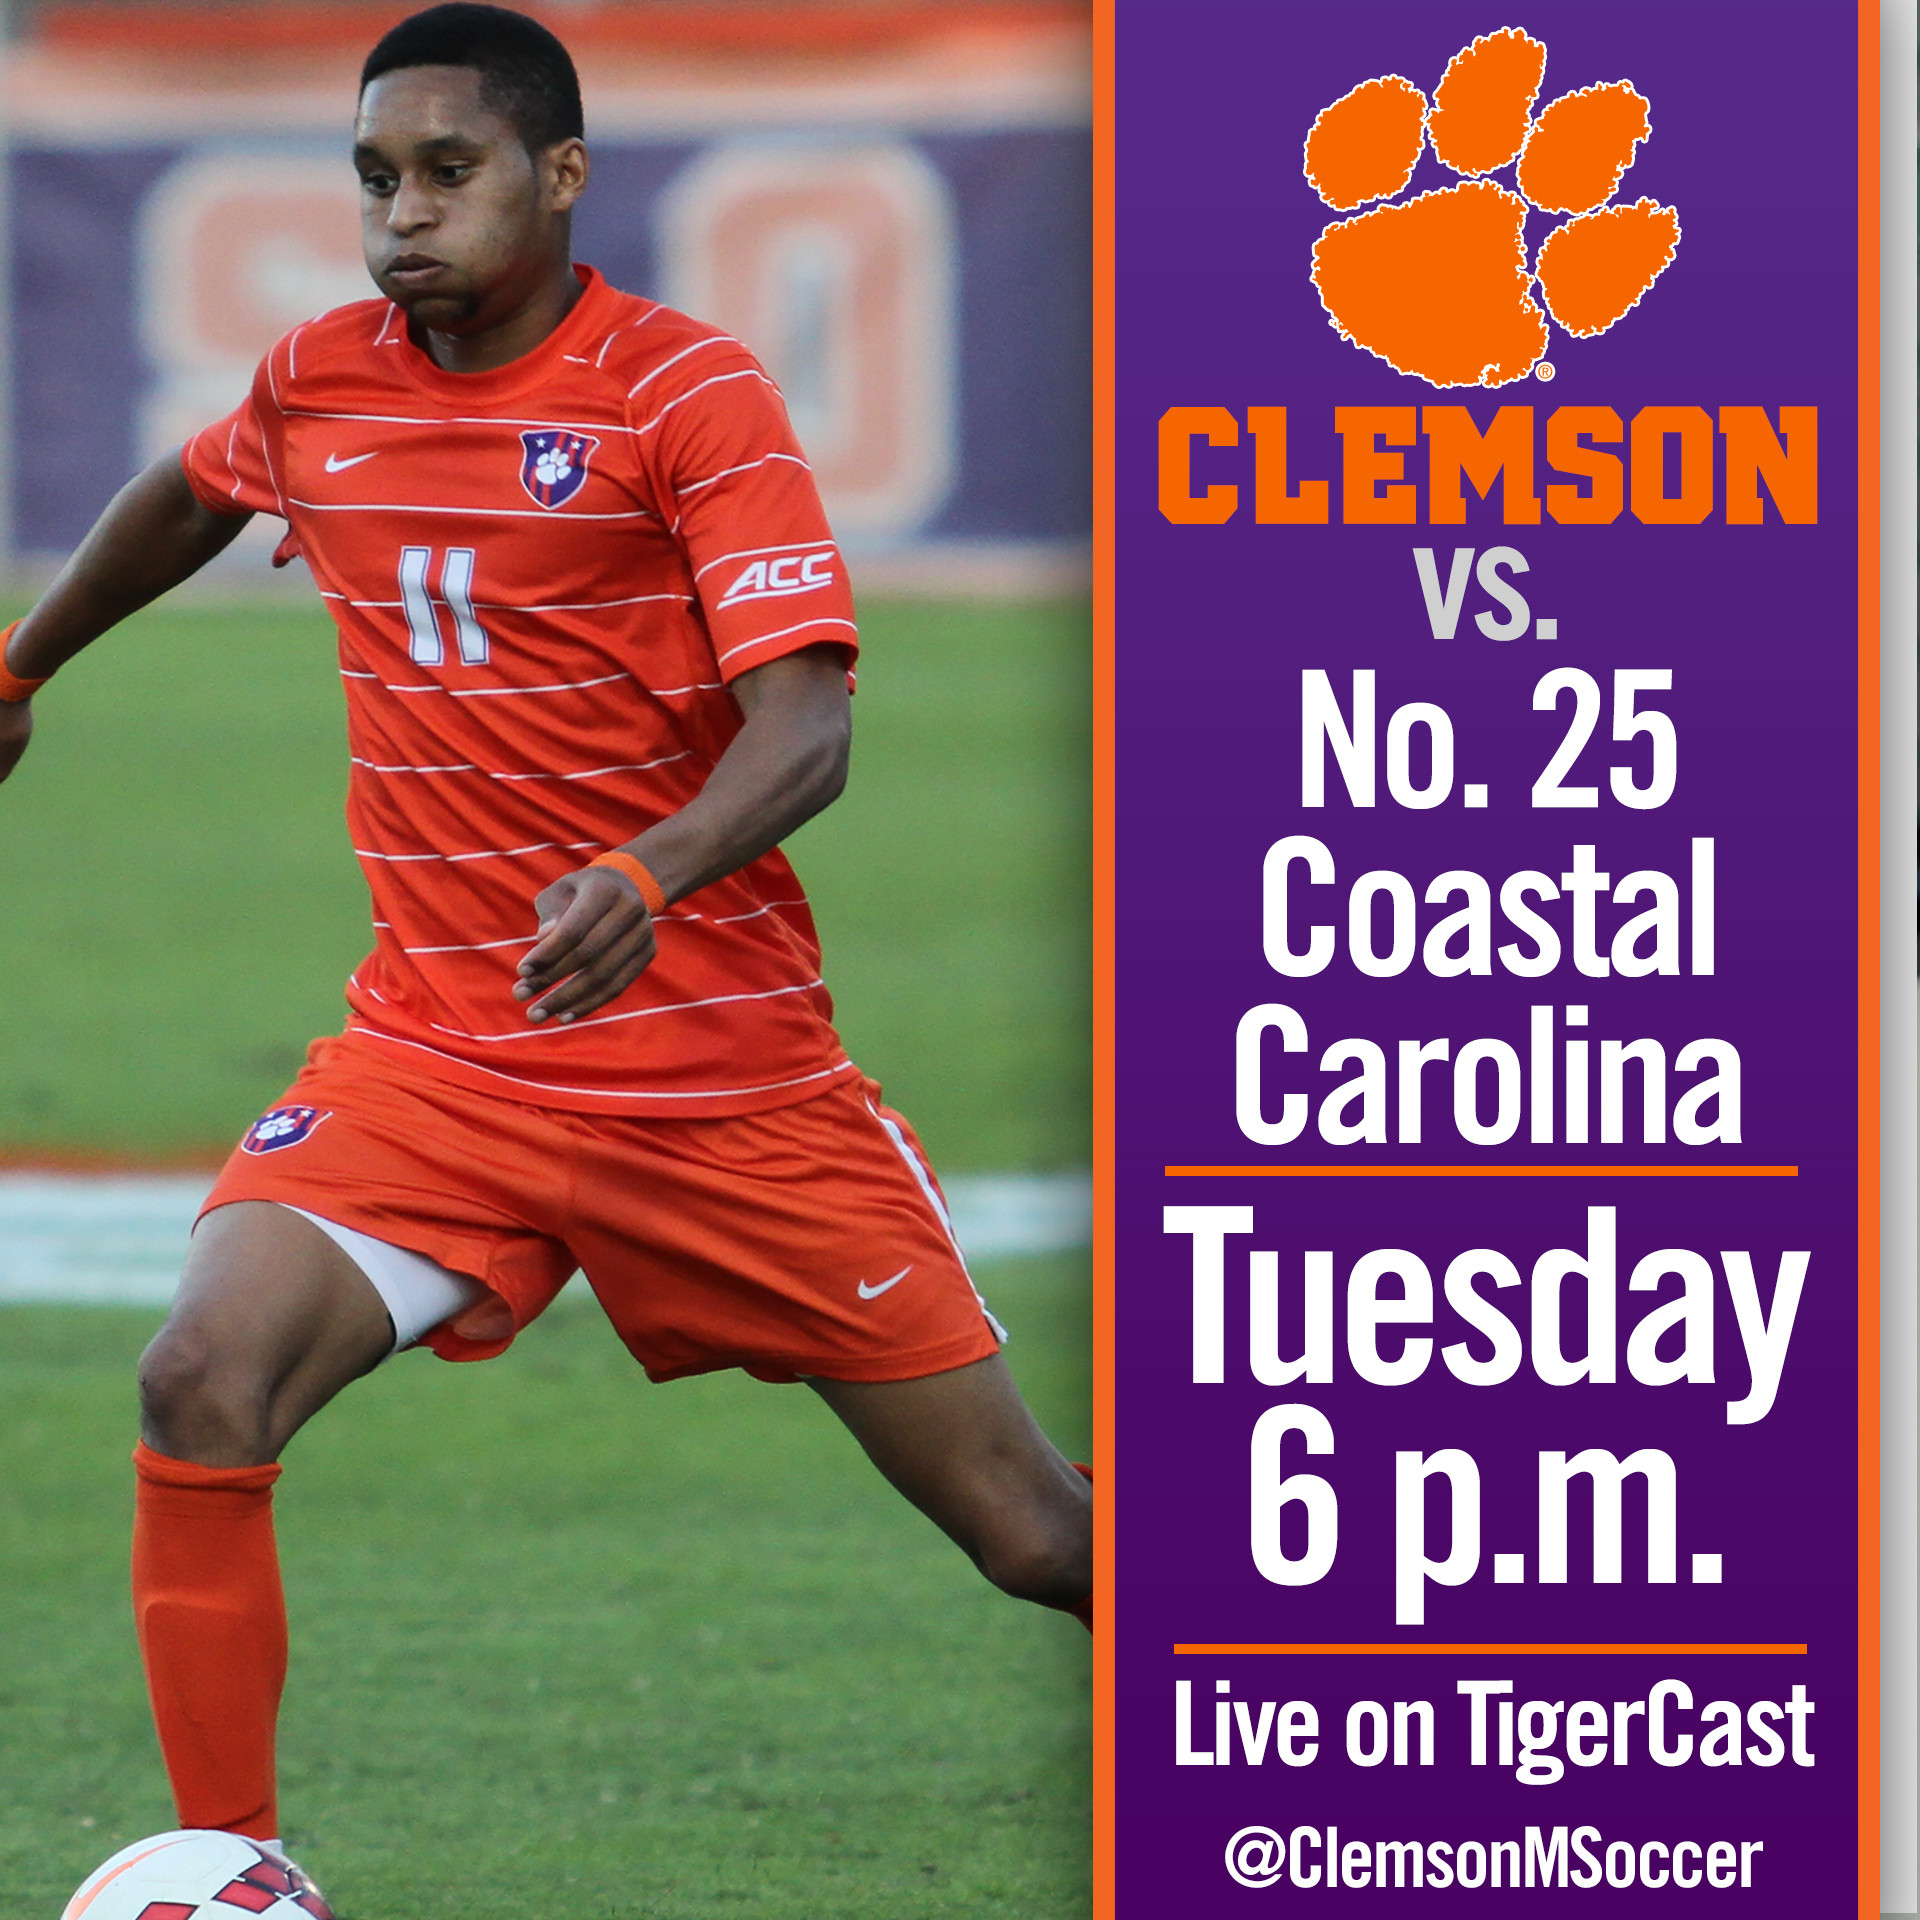 Clemson Hosts No. 25 Coastal Carolina in Rescheduled Match Tuesday